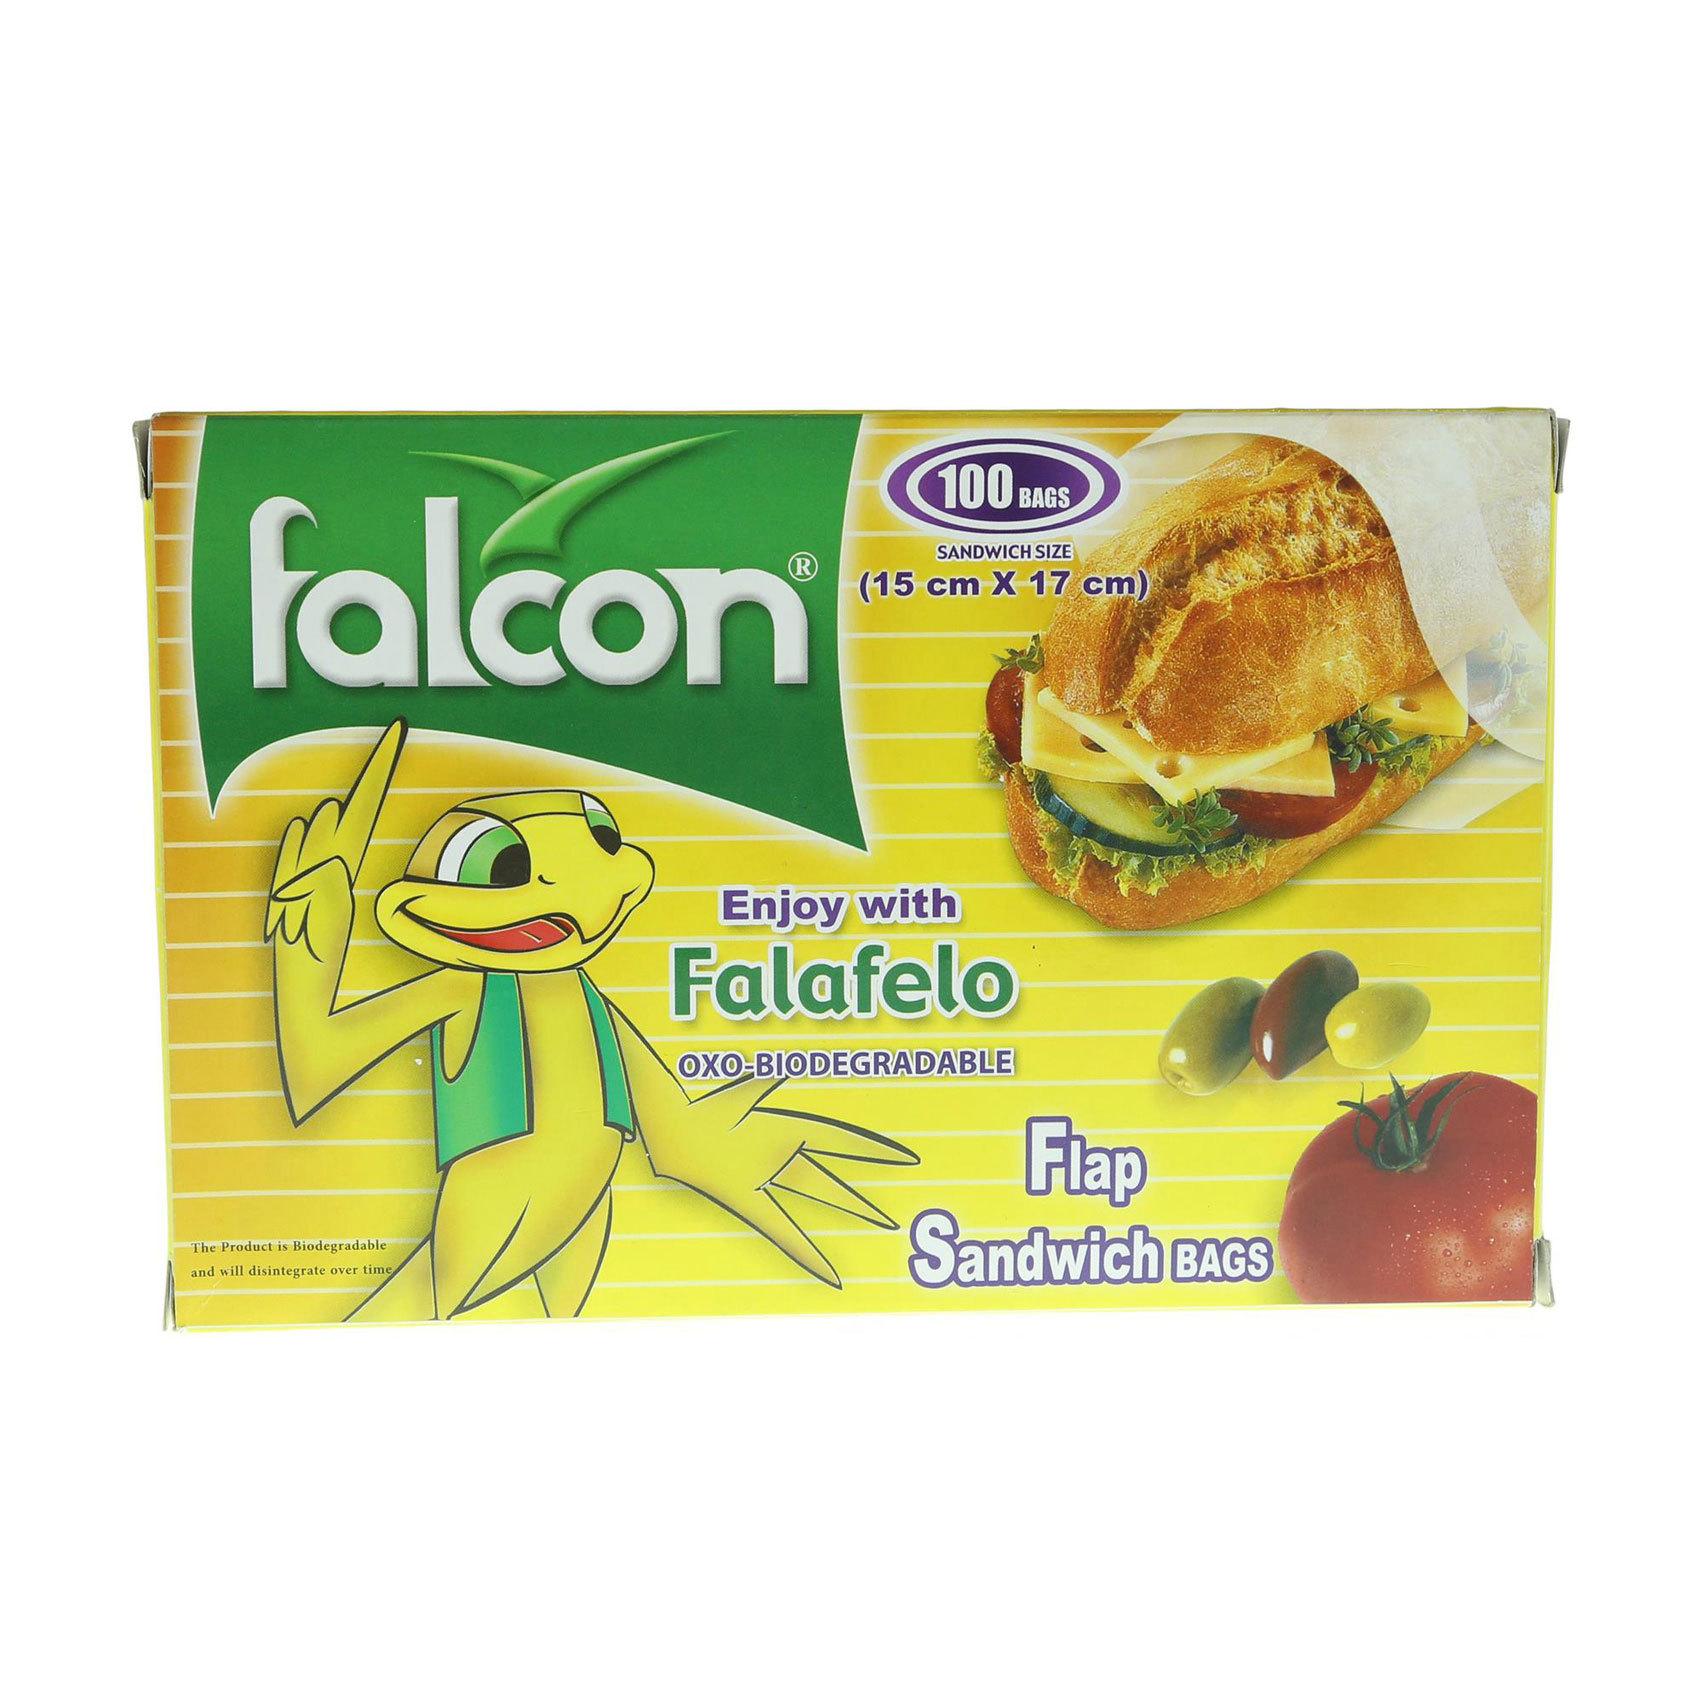 FALCON SANDWICH BAG 100